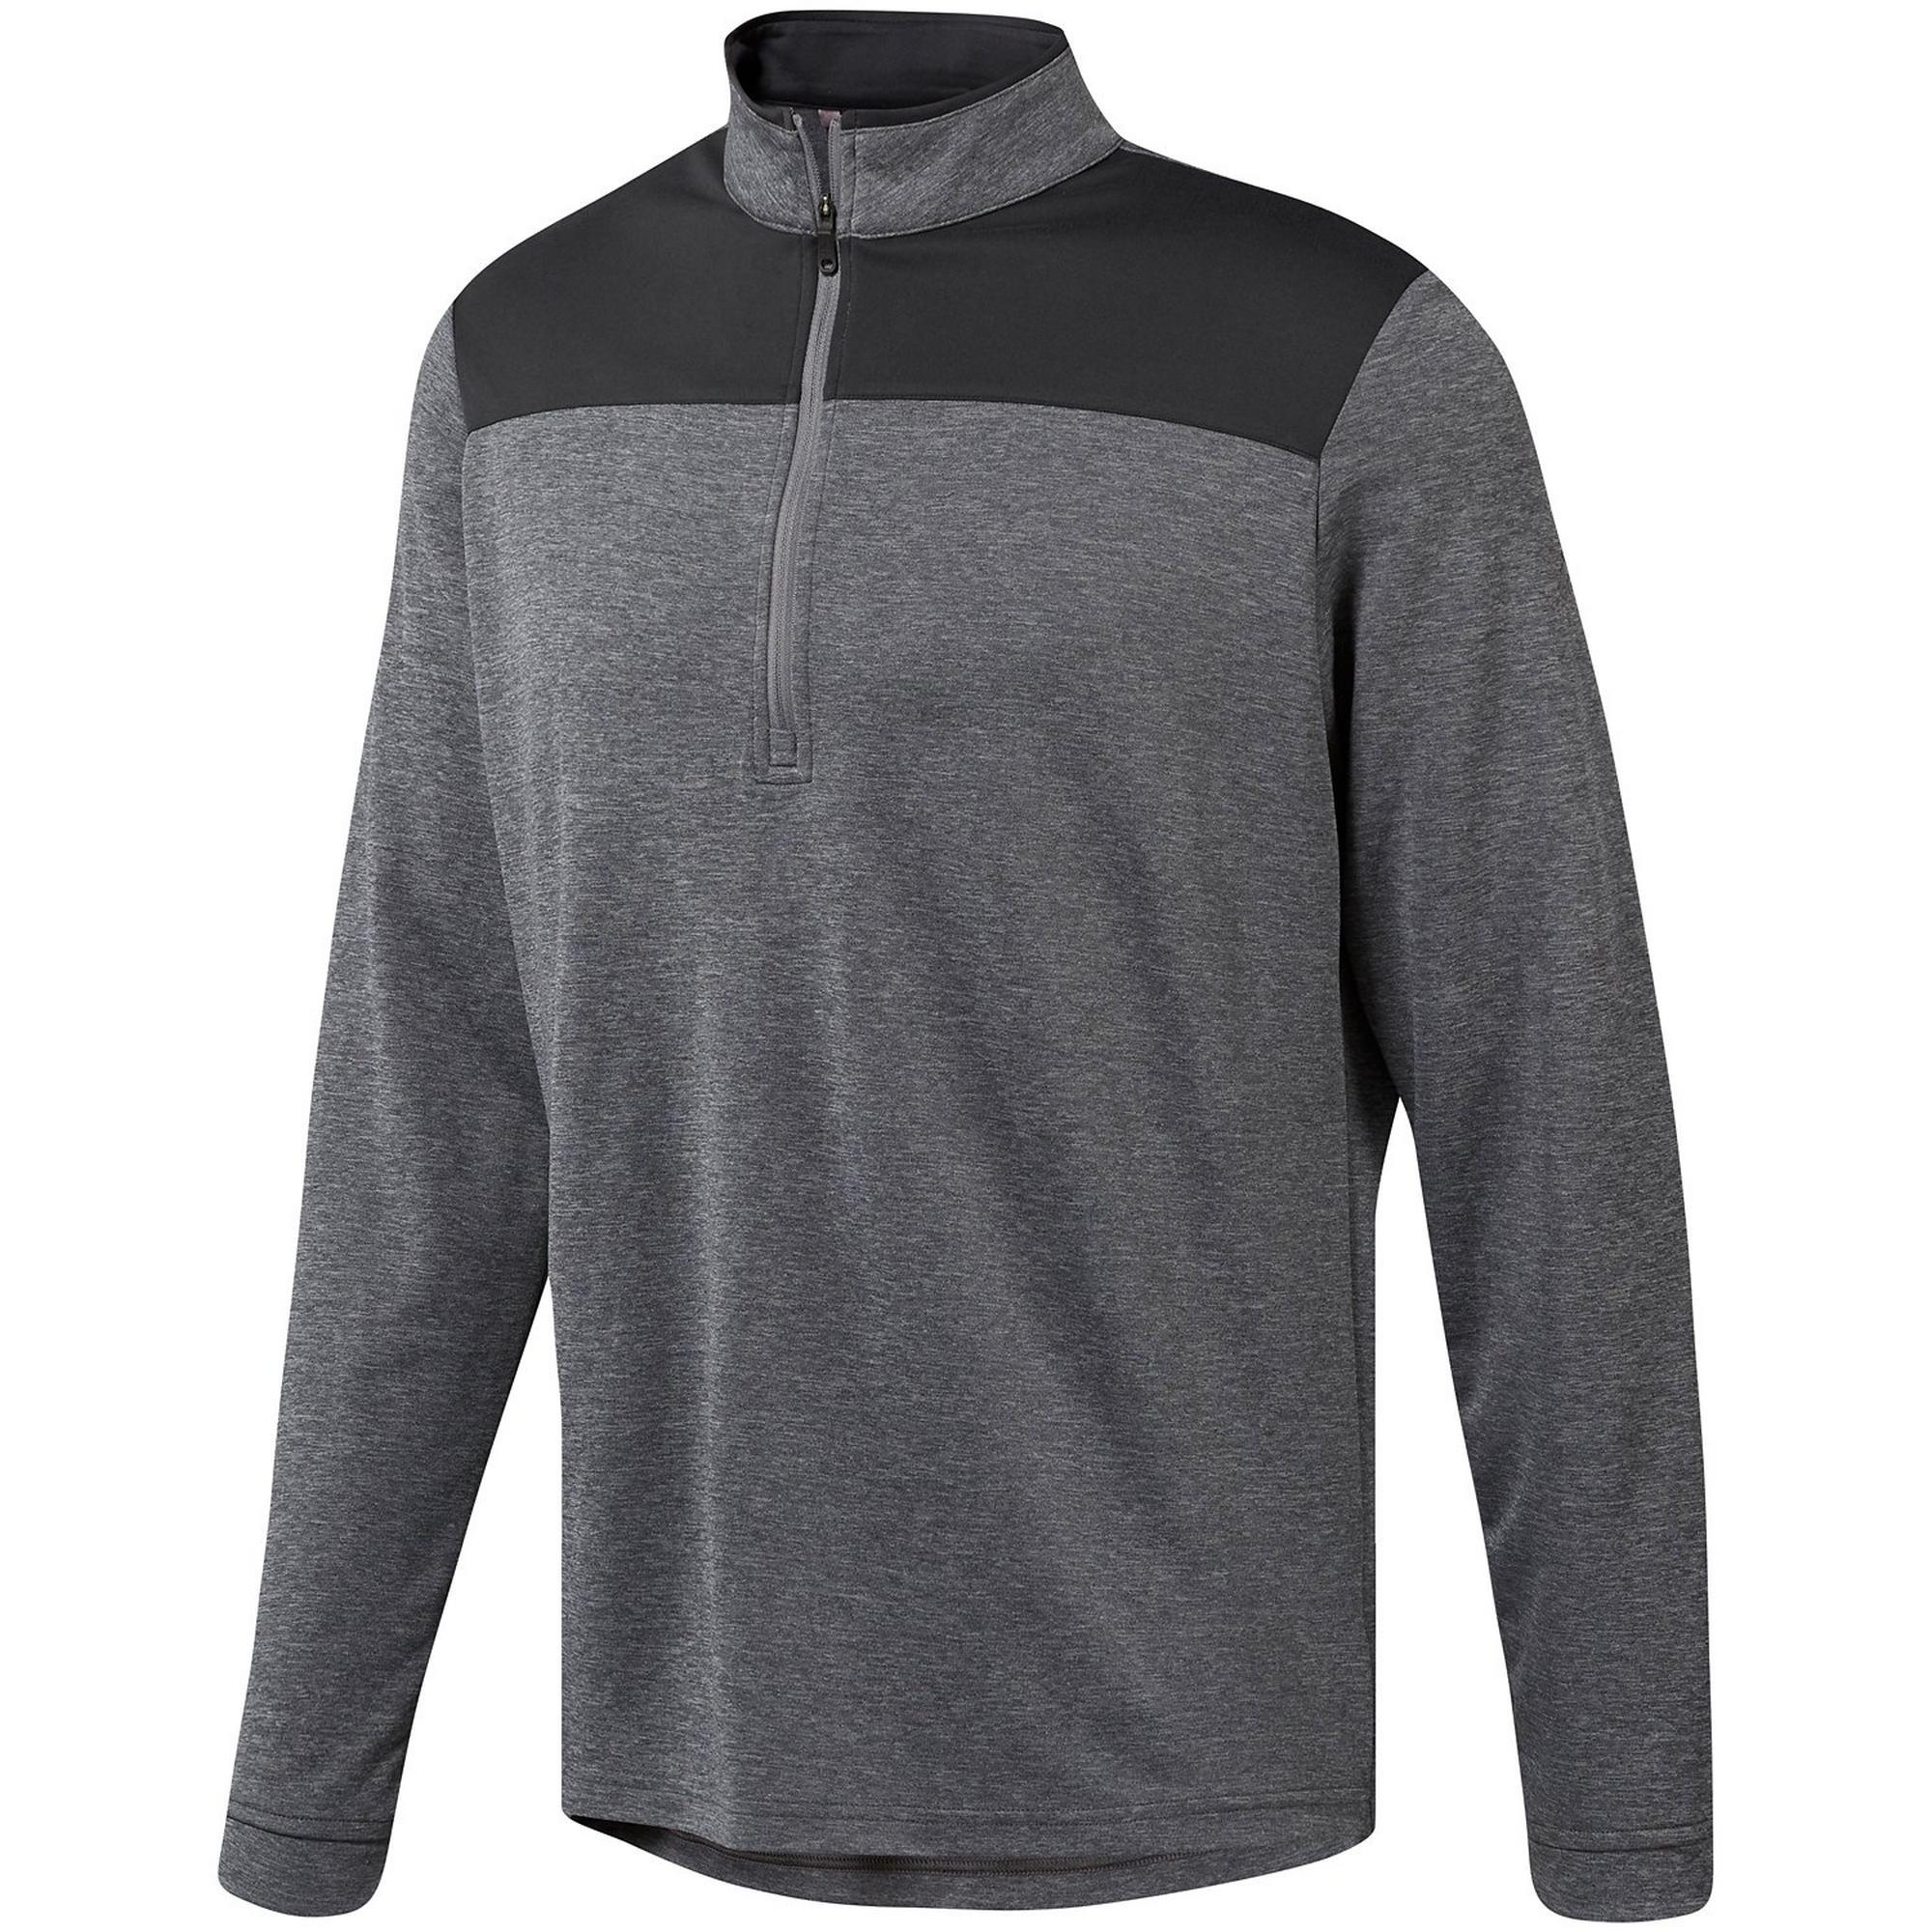 Men's Lightweight UPF 1/4 Zip Pullover